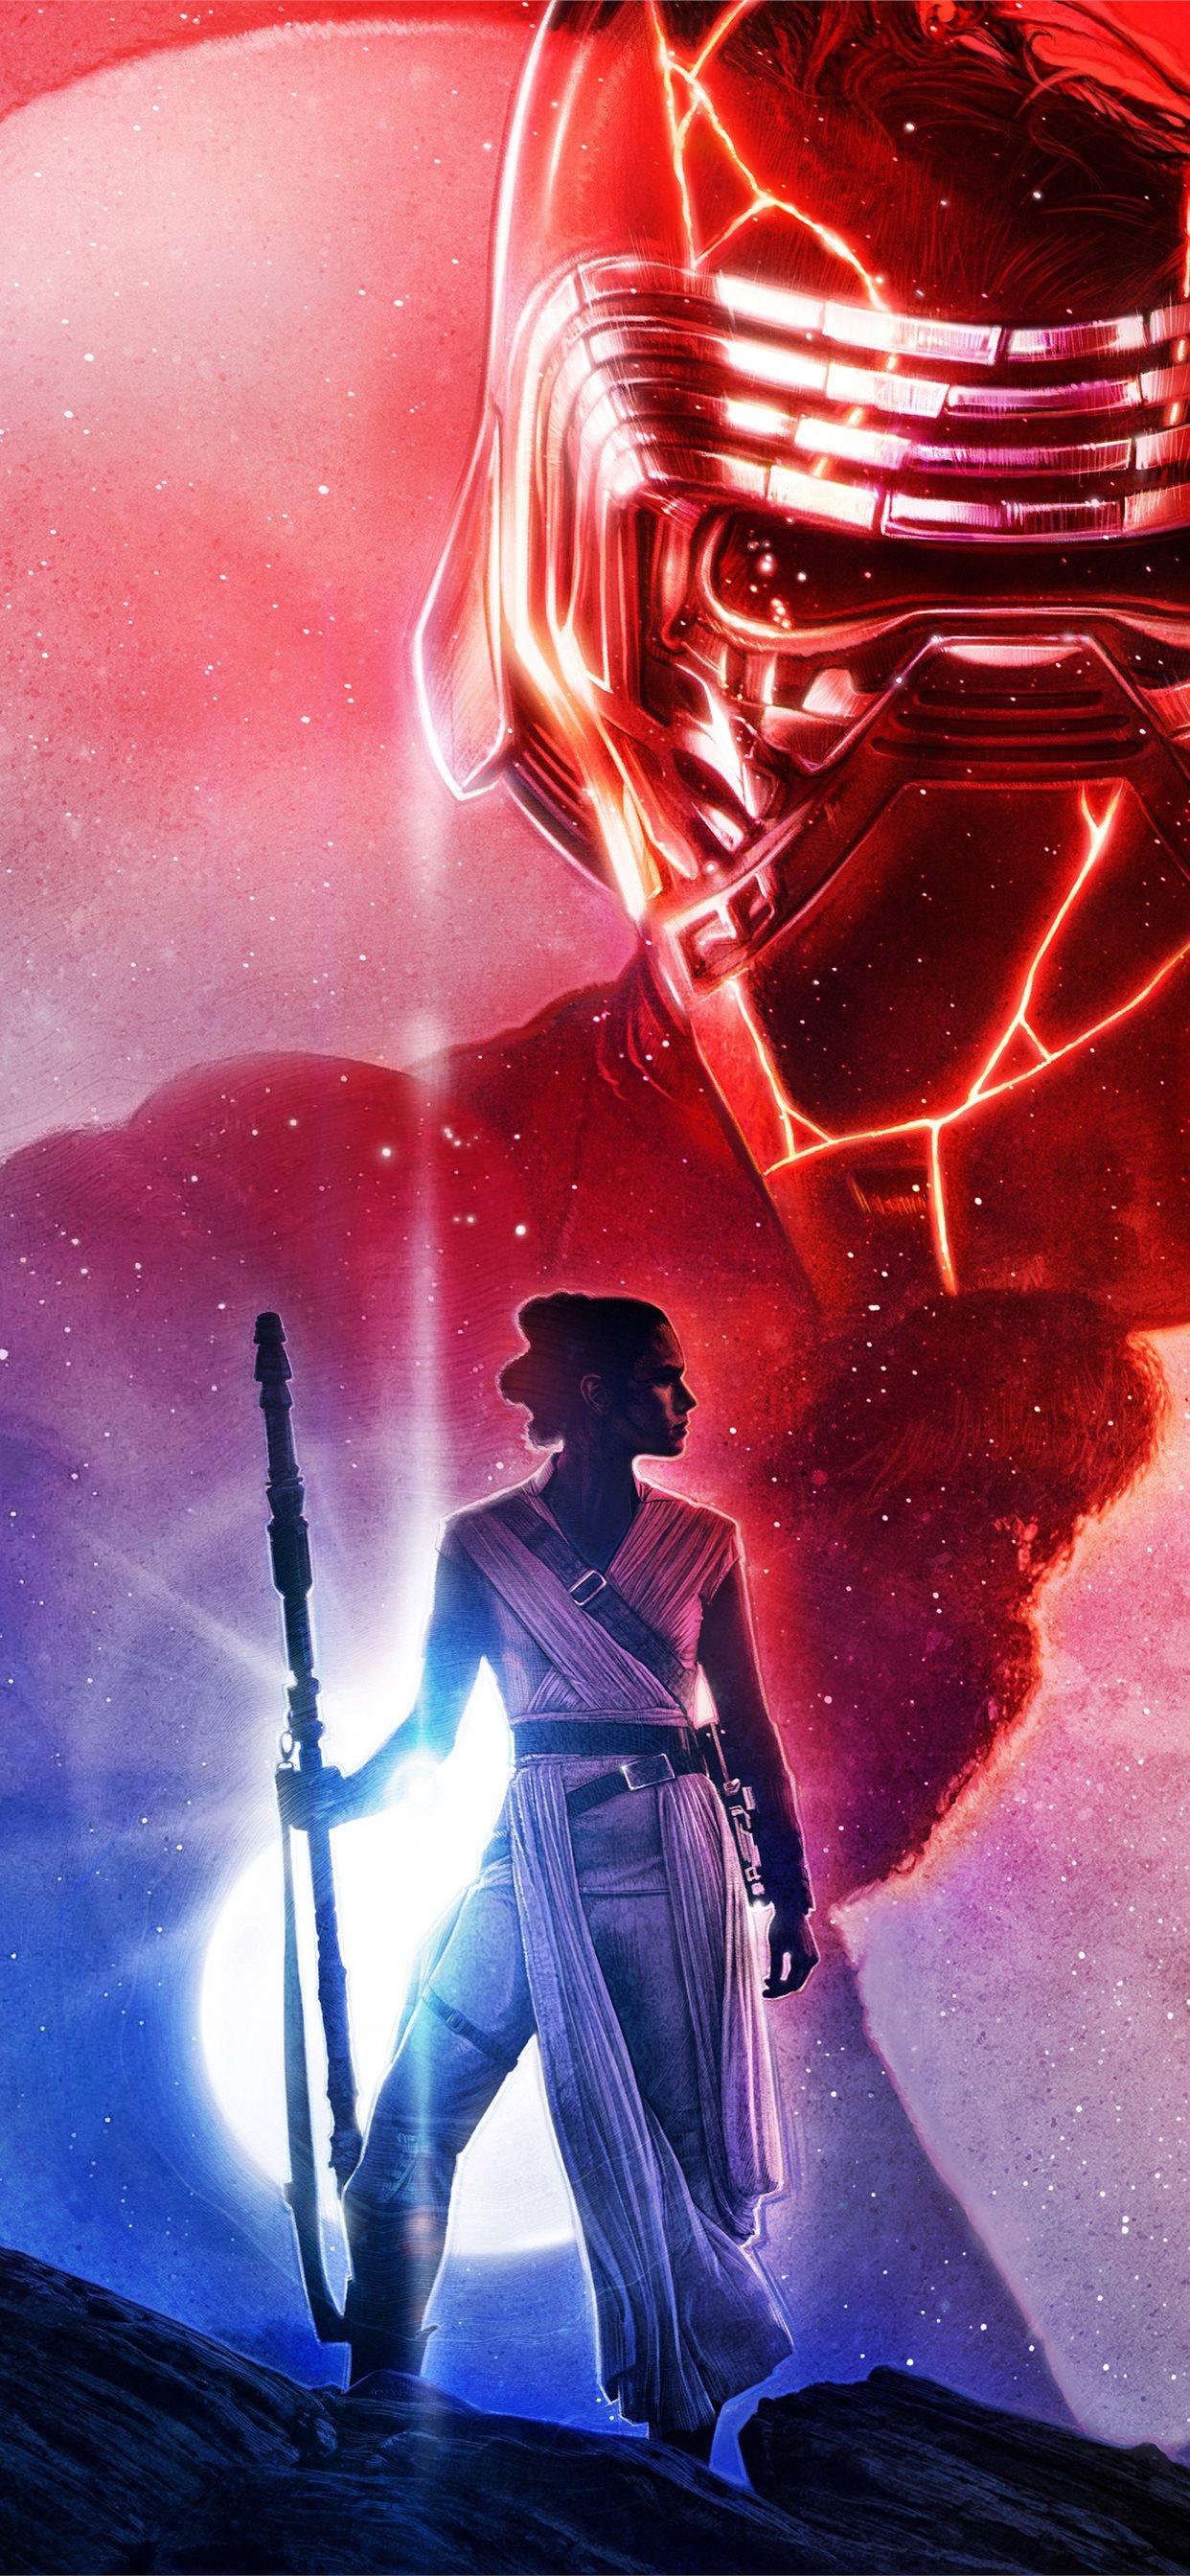 Star Wars The Last Jedi Art 5k Iphone 11 Wallpapers Free Download